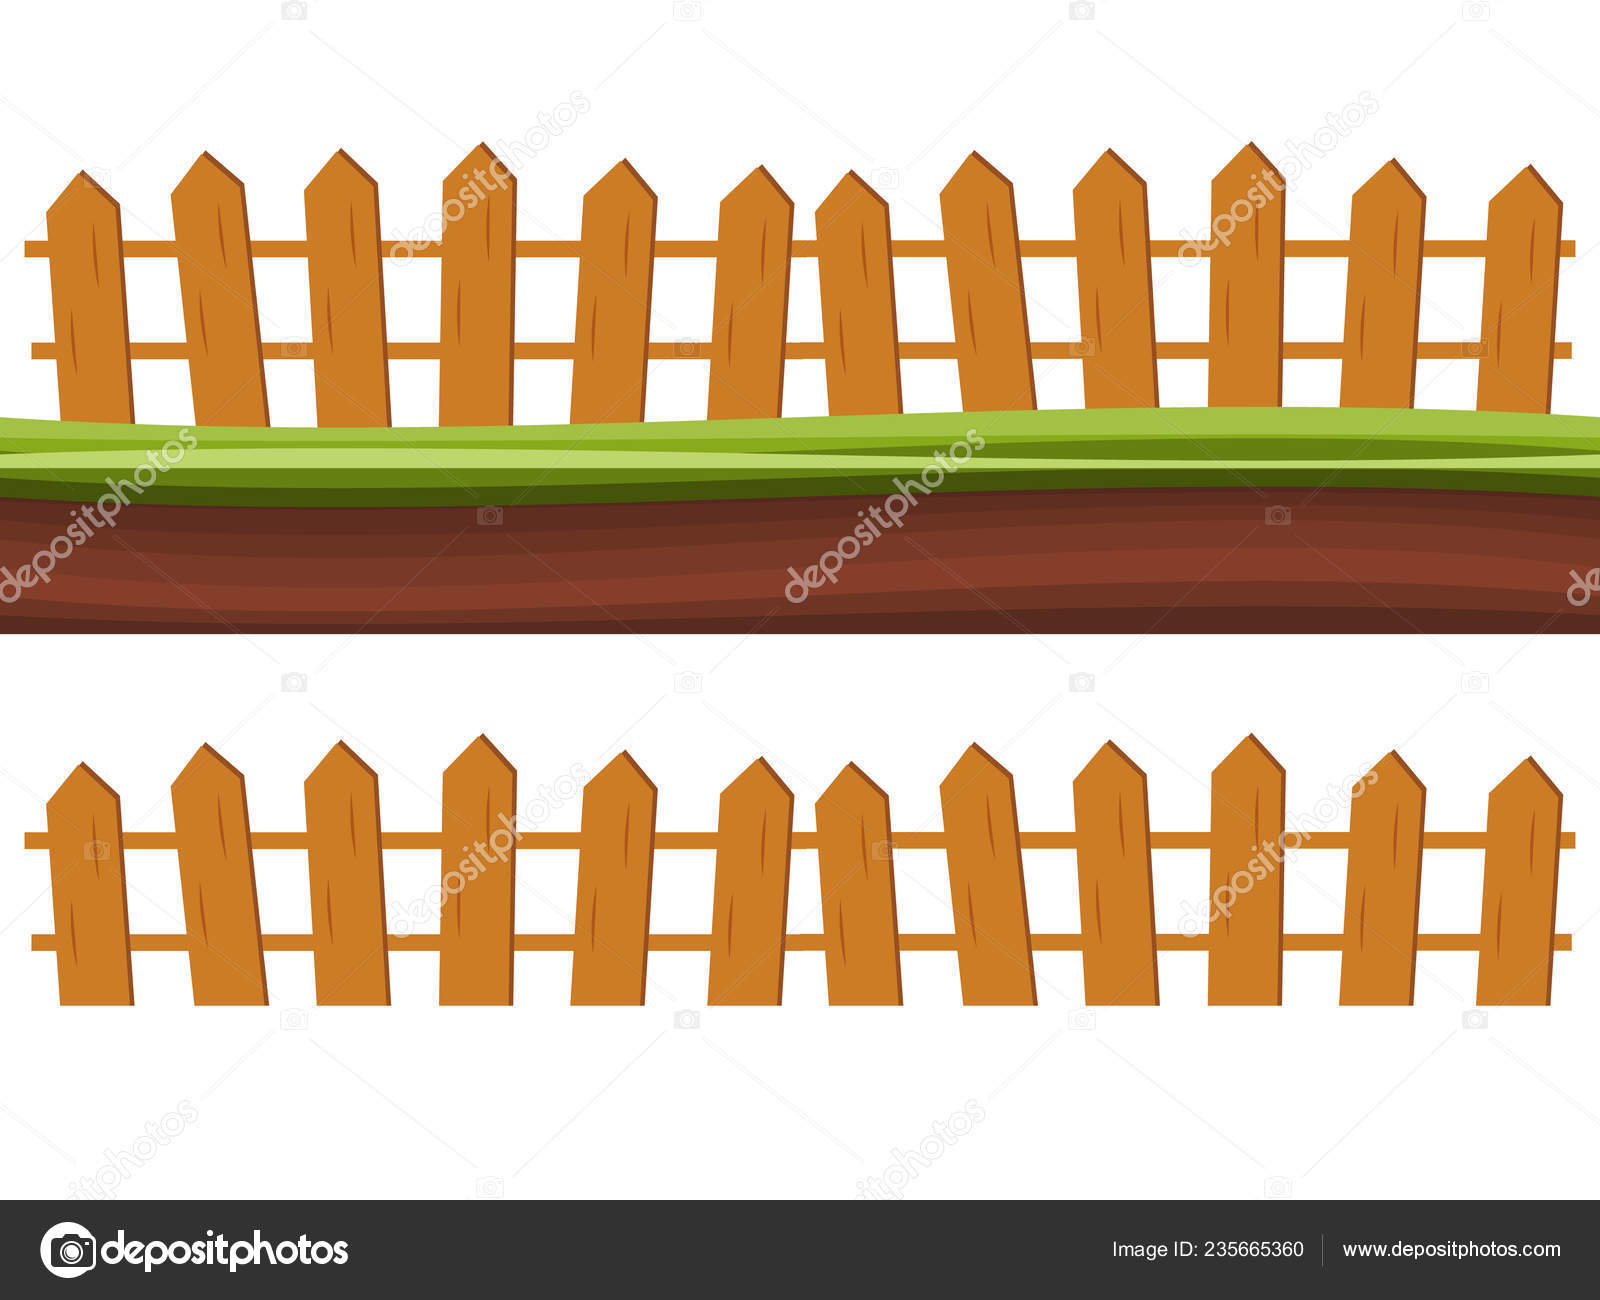 Cartoon Rural Wooden Fence Green Grass Vector Illustration Wood